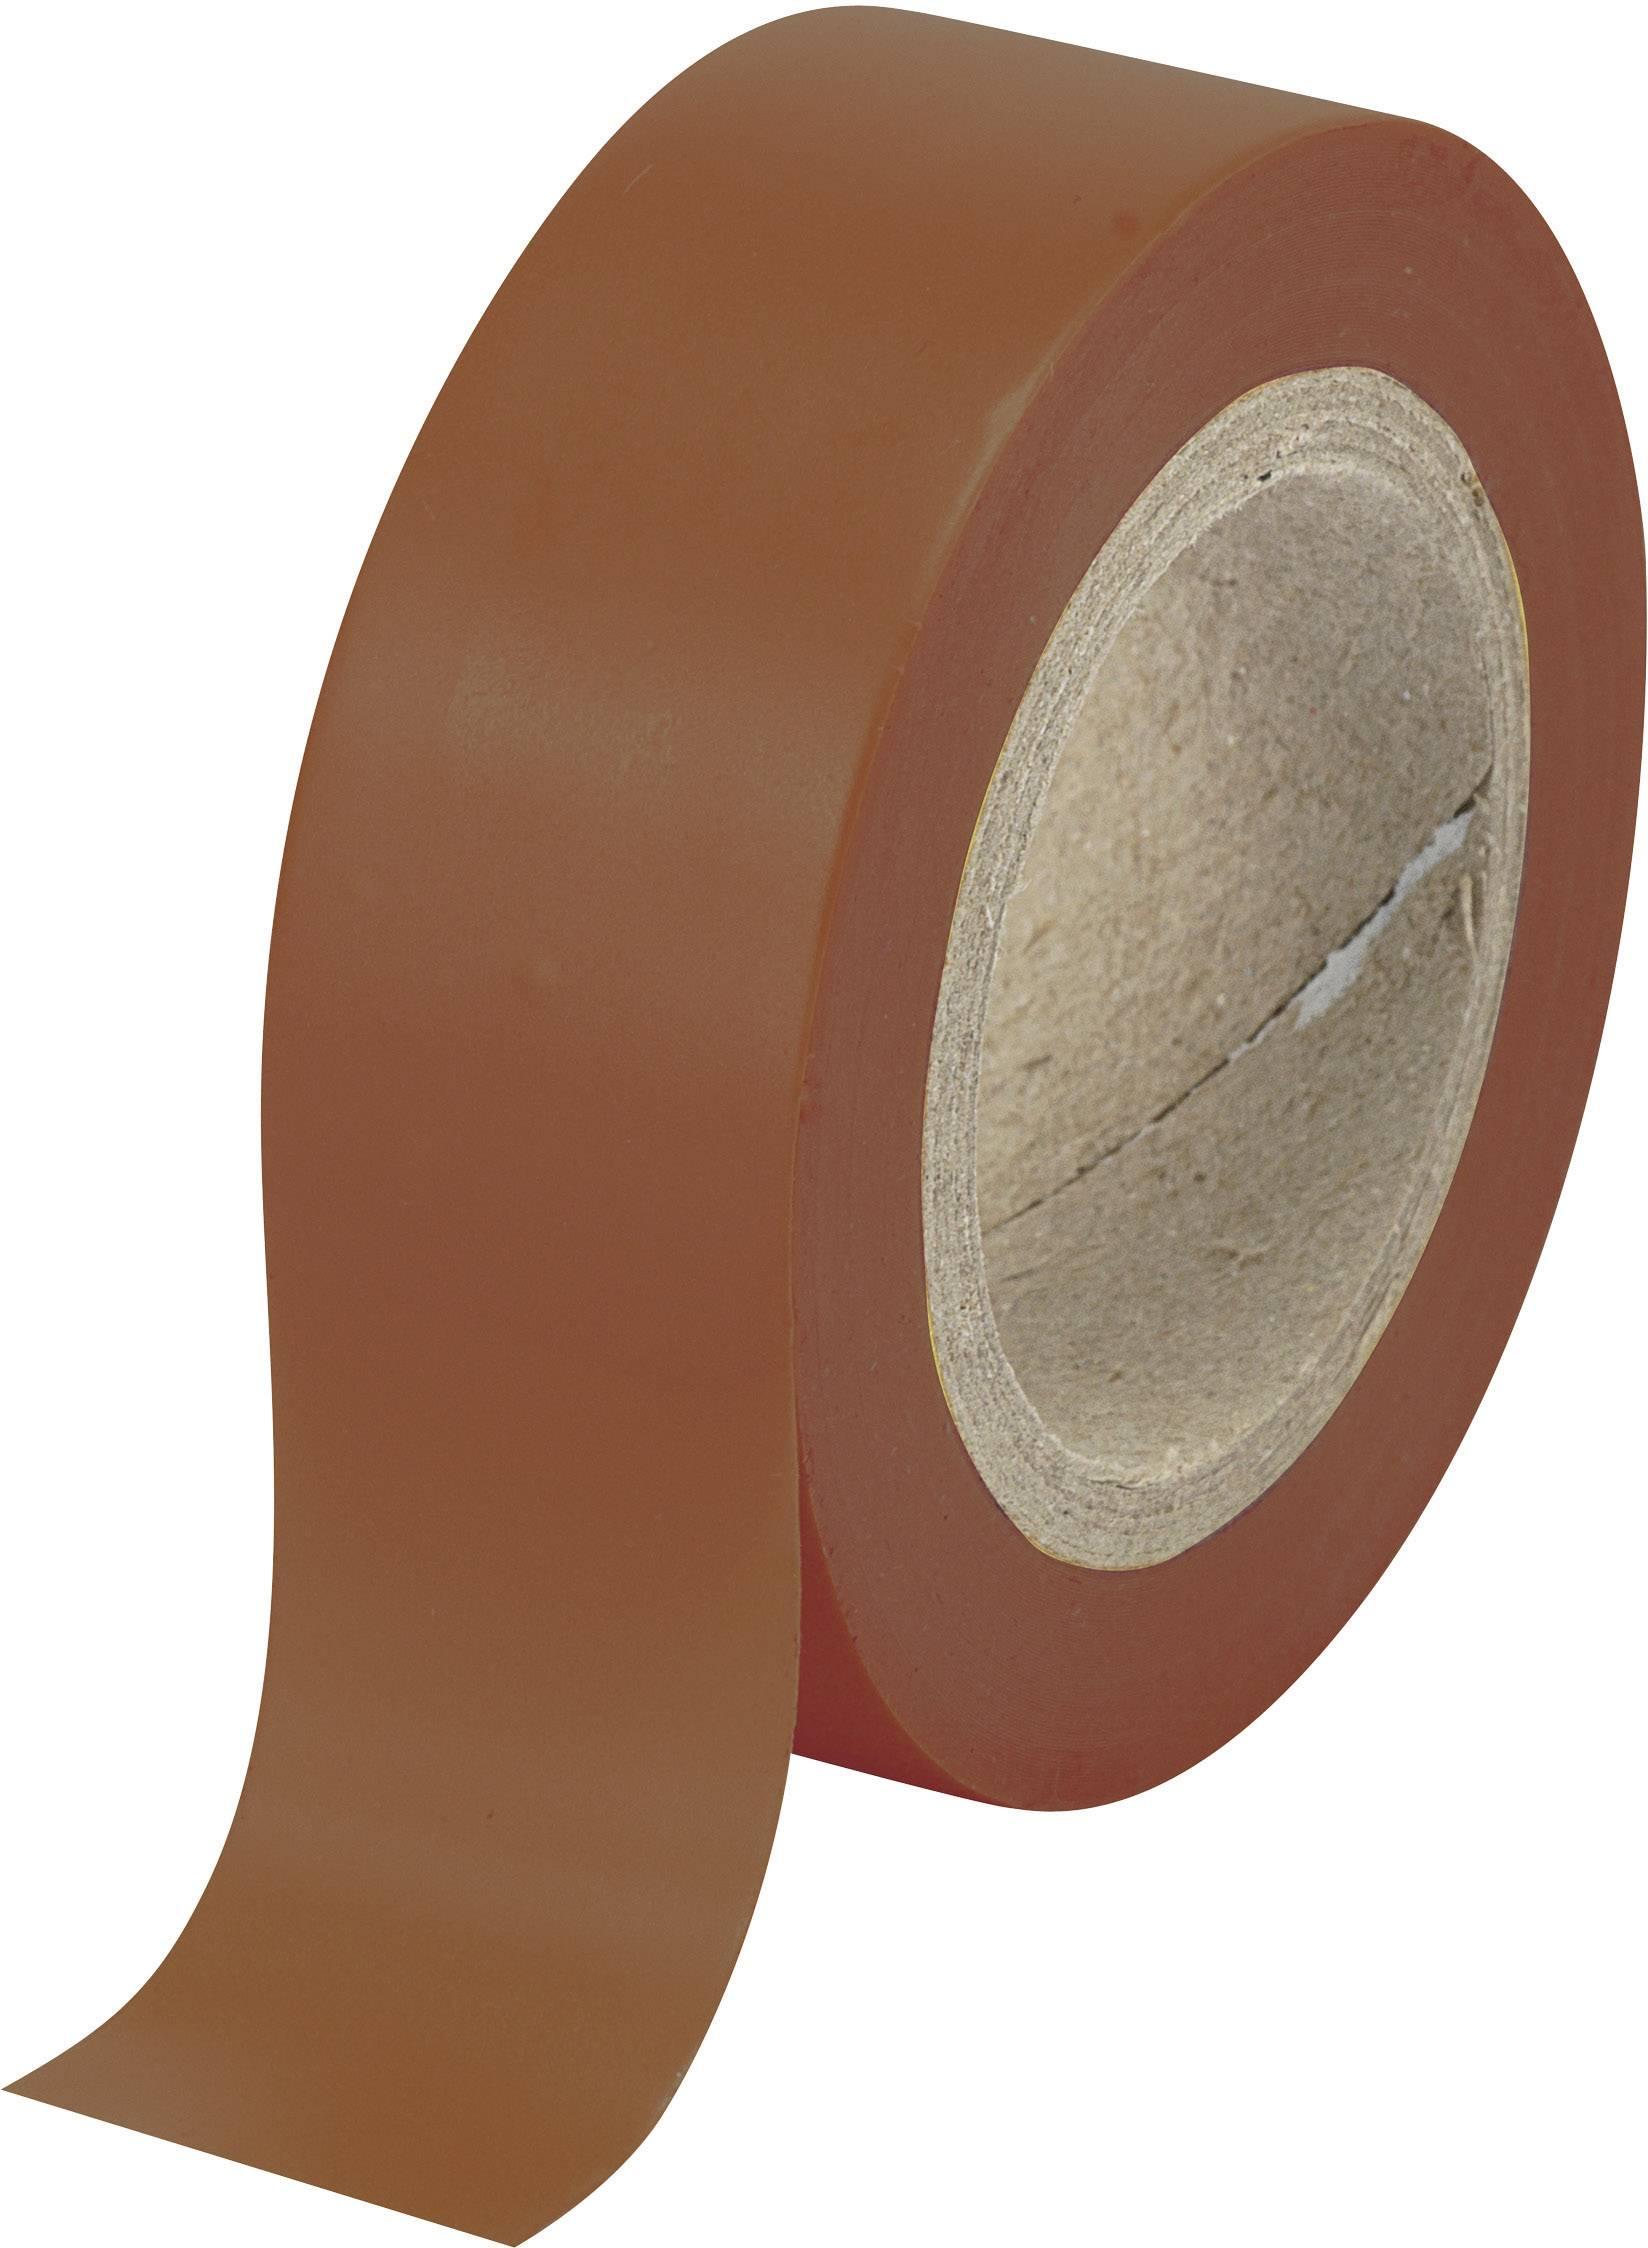 Izolačná páska Conrad Components 540915BN 548122, (d x š) 10 m x 19 mm, hnedá, 1 roliek